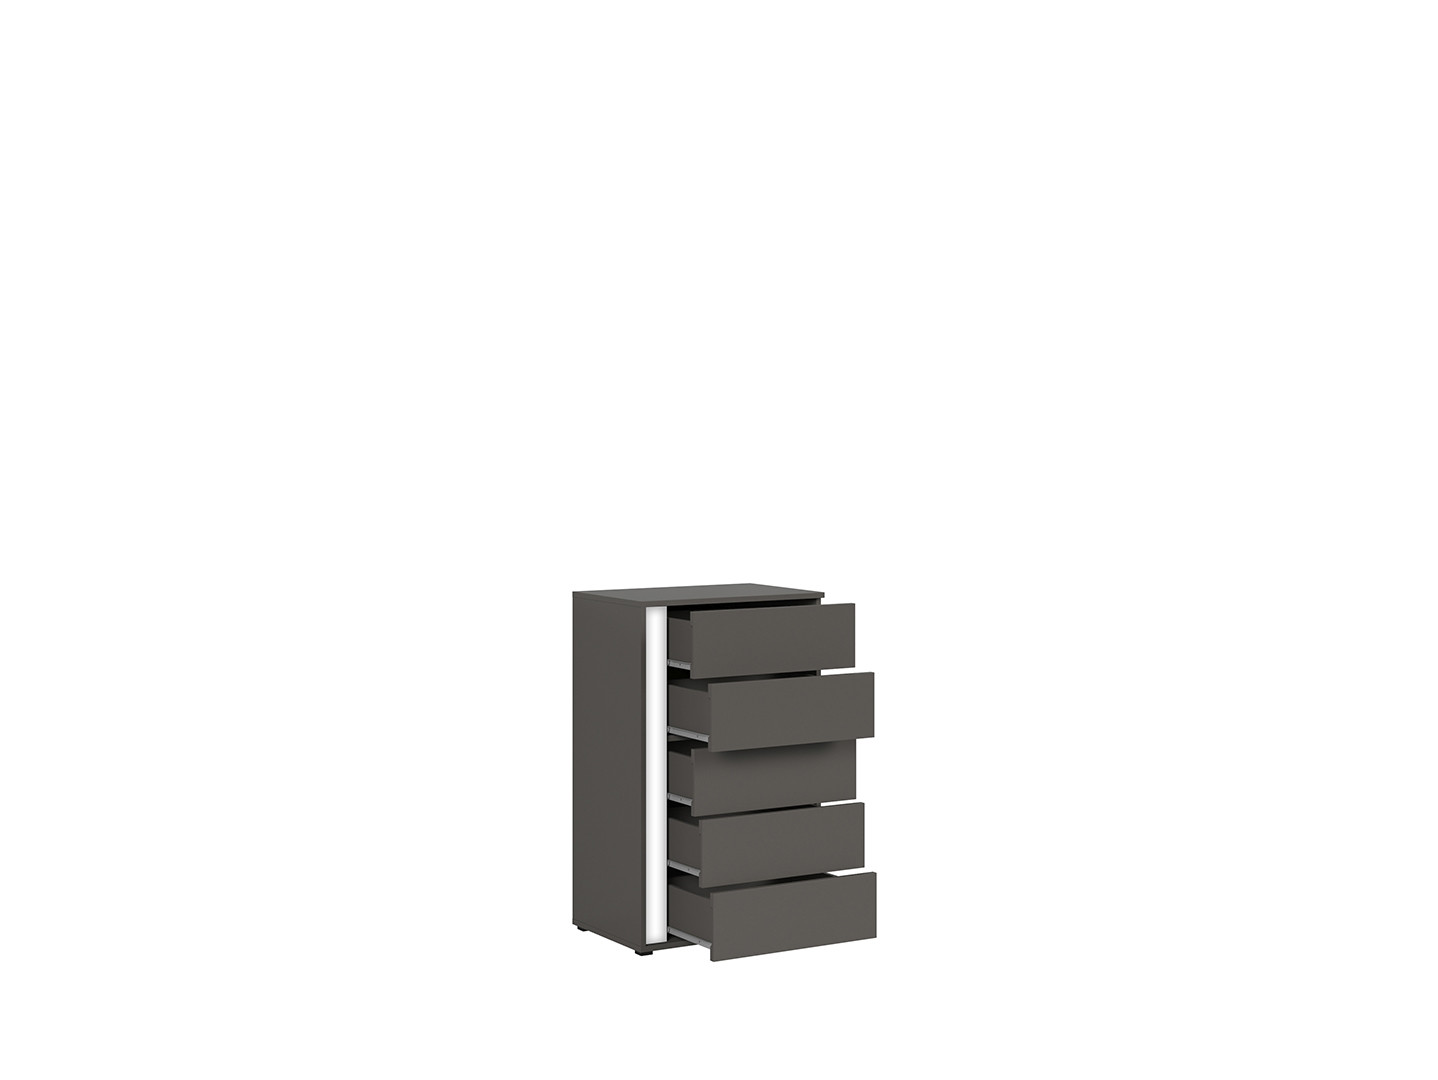 Komoda GRAPHIC KOM5SP/C sivý wolfram